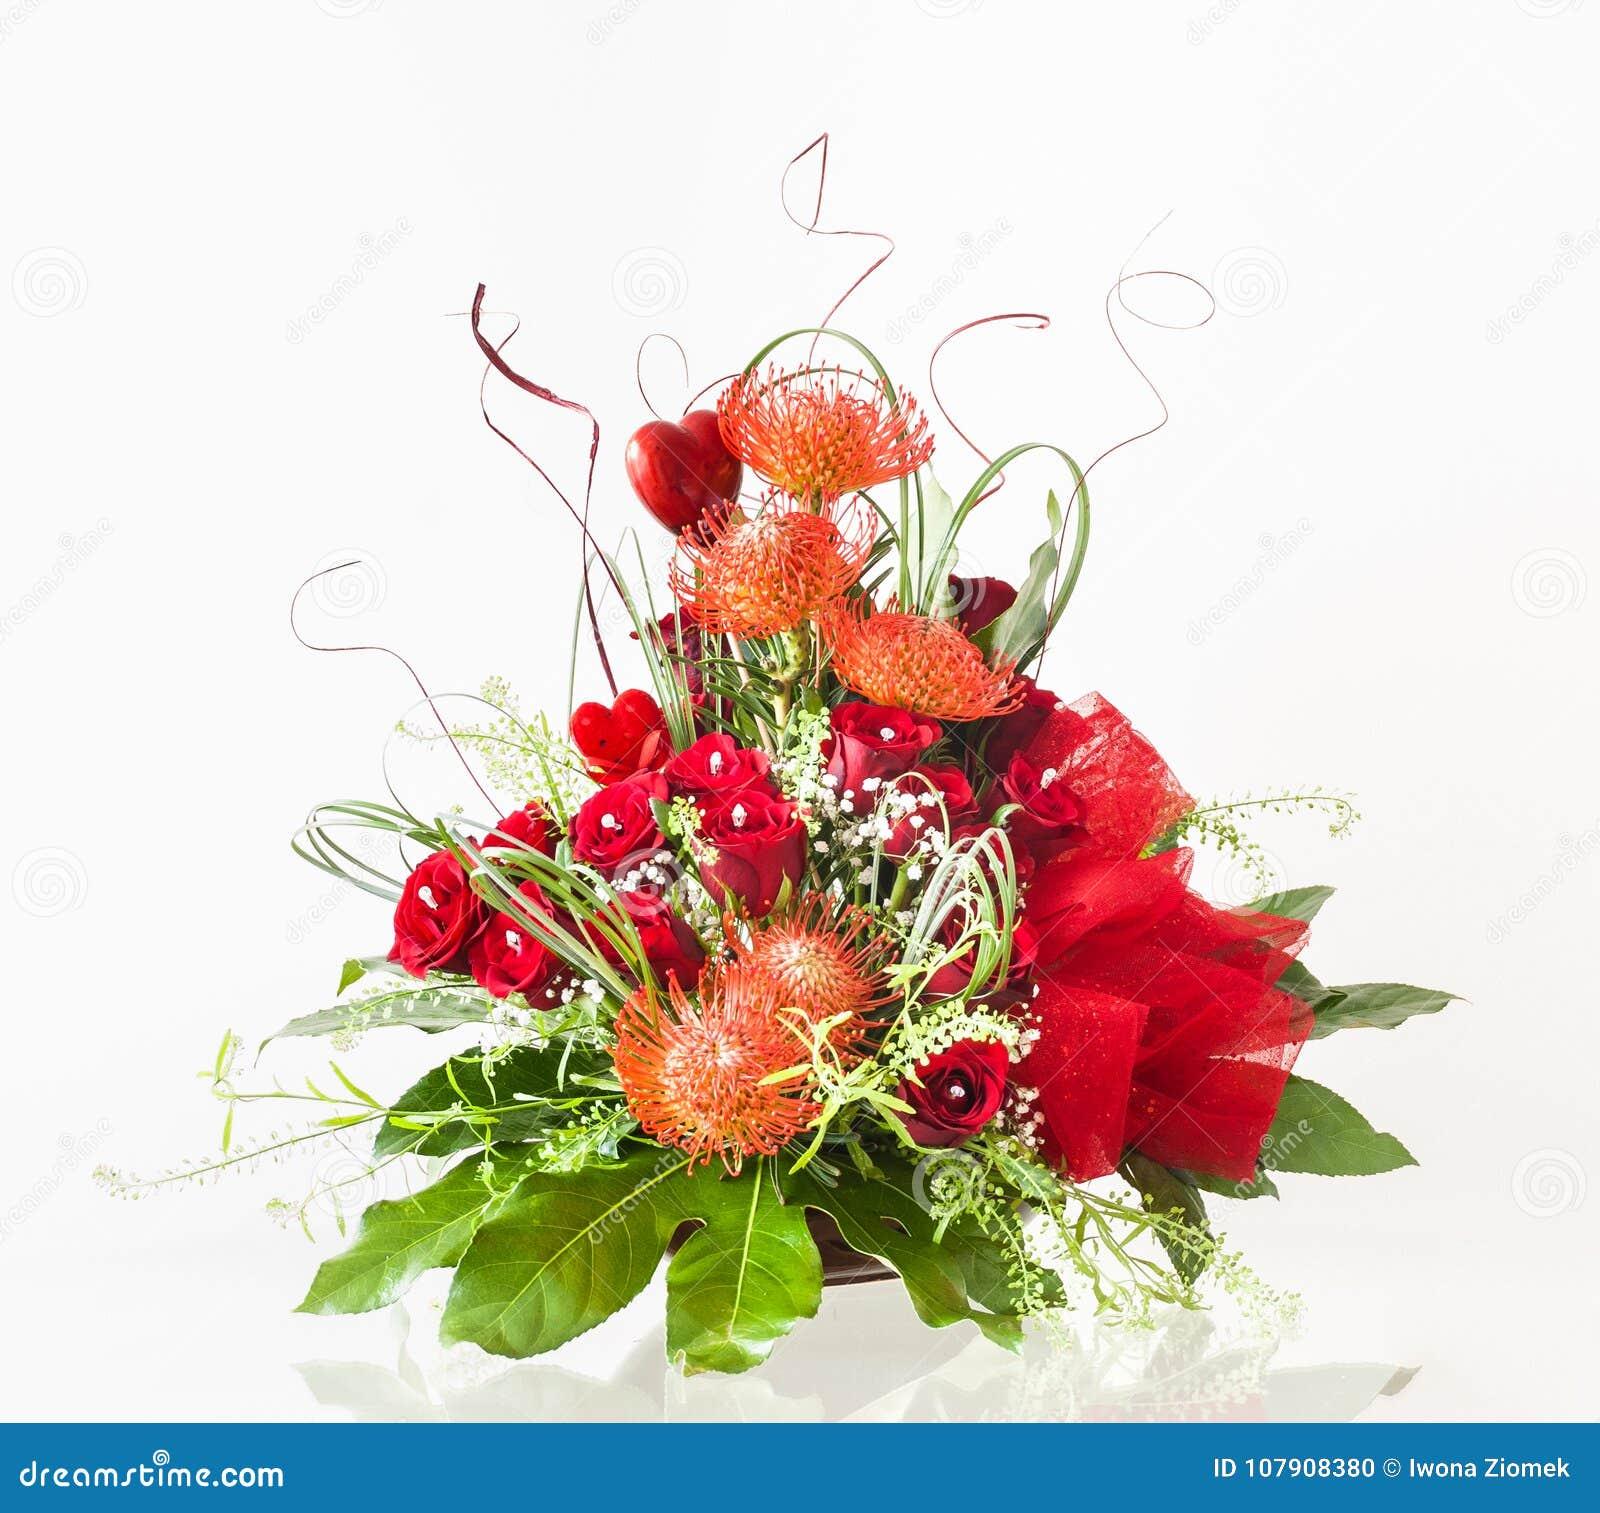 Beautiful valentines day flower arrangement stock photo image of beautiful valentines day flower arrangement izmirmasajfo